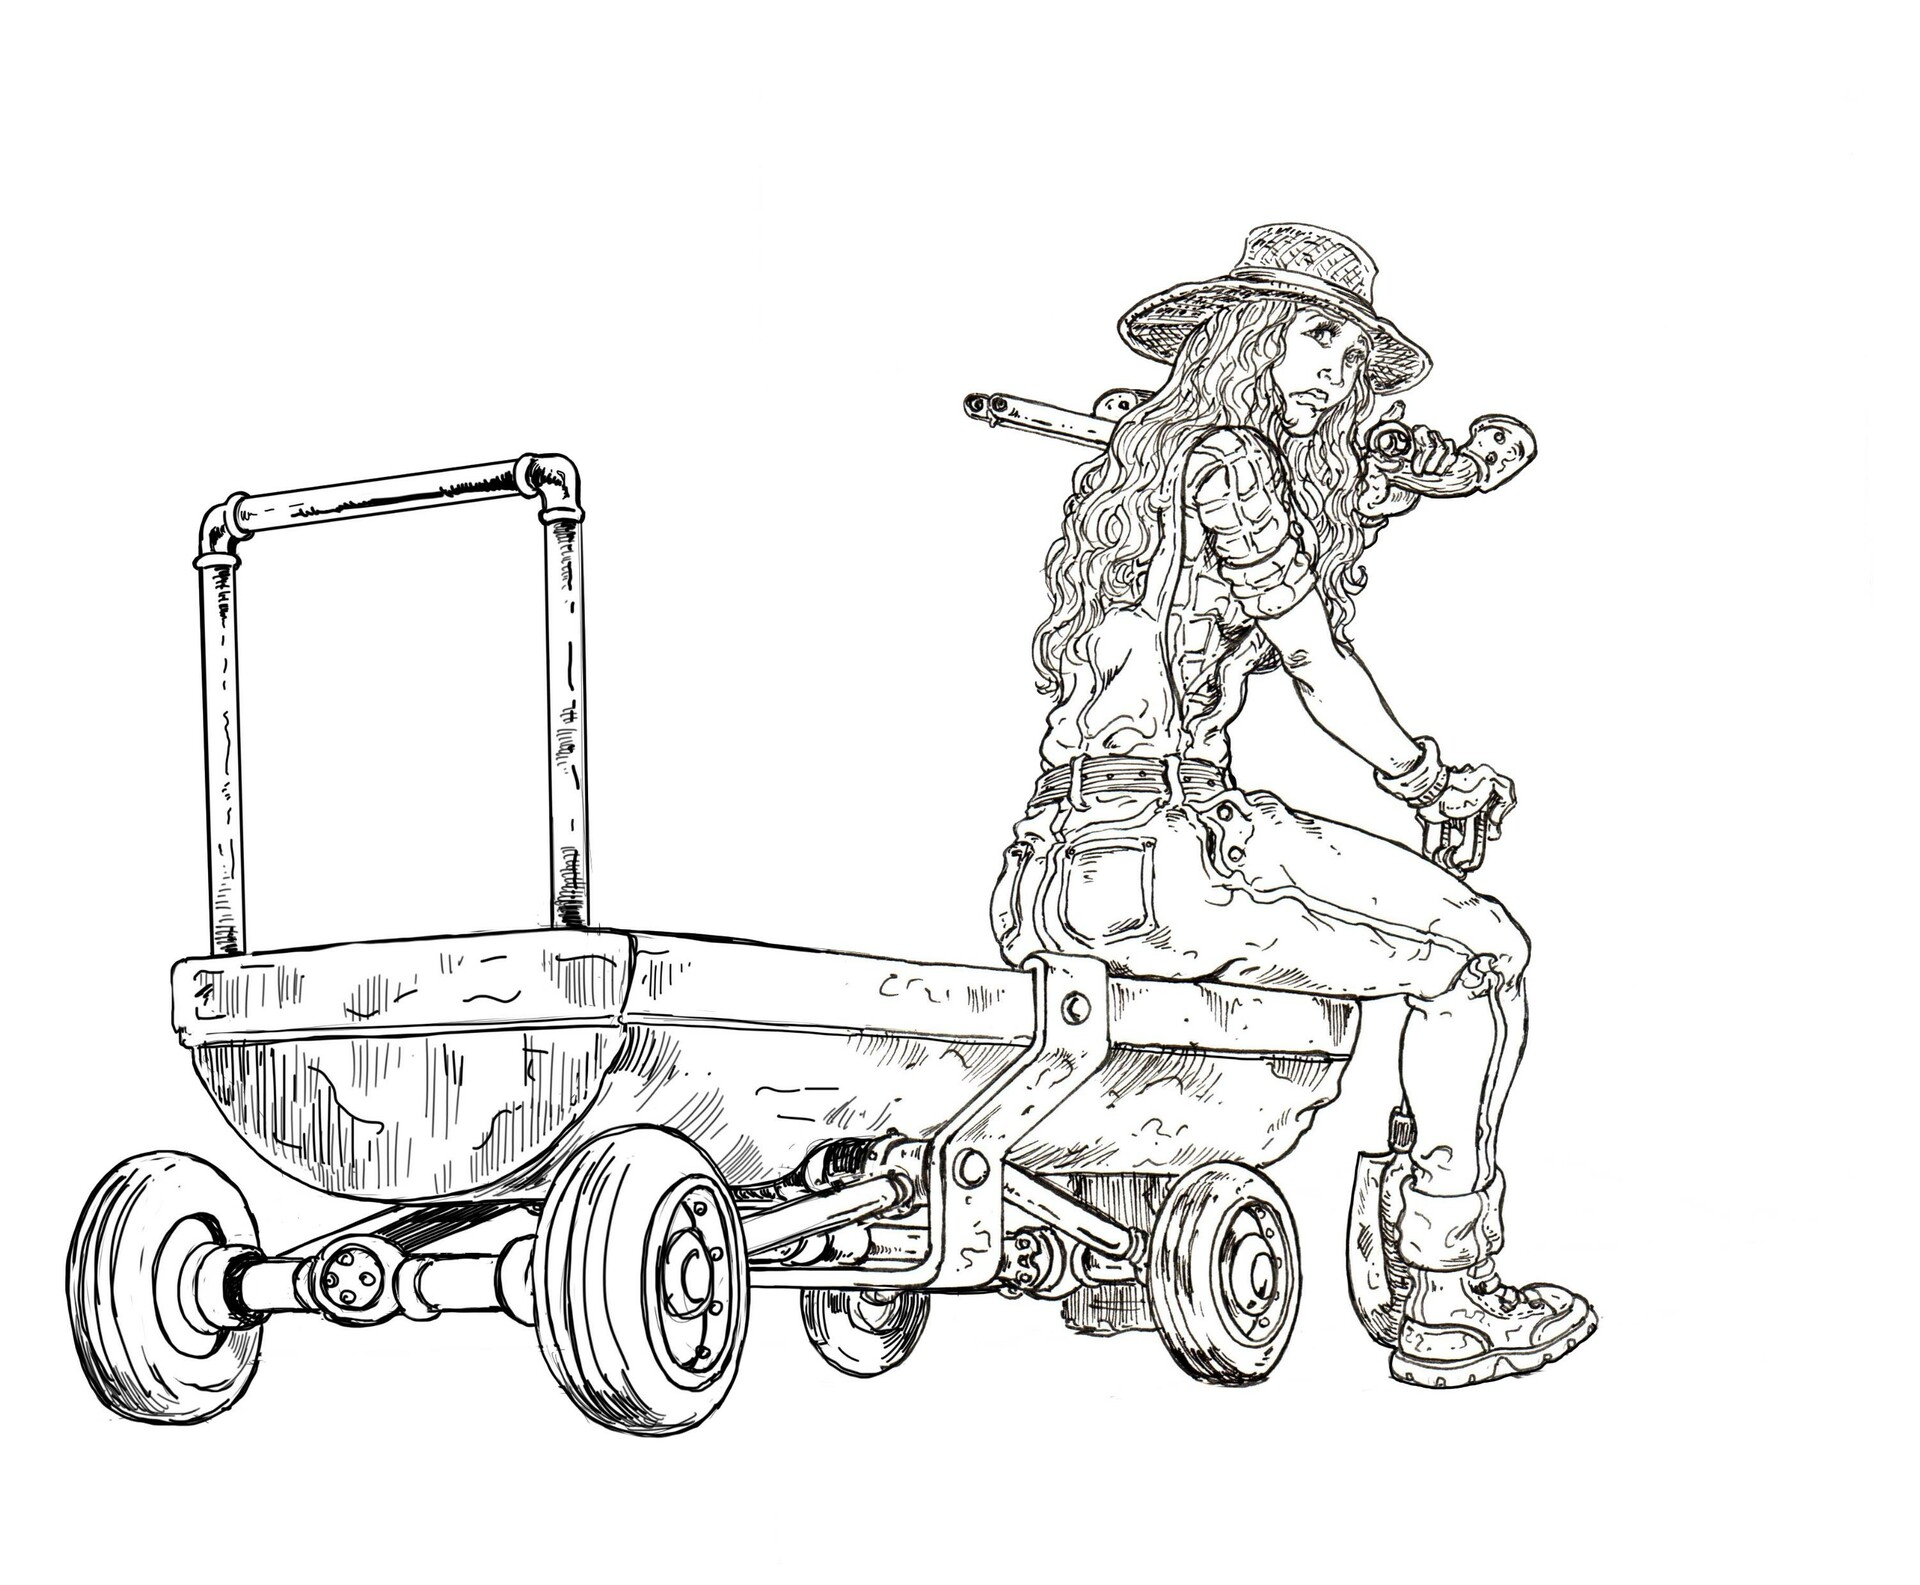 Vincent bryant 38 handcart sally